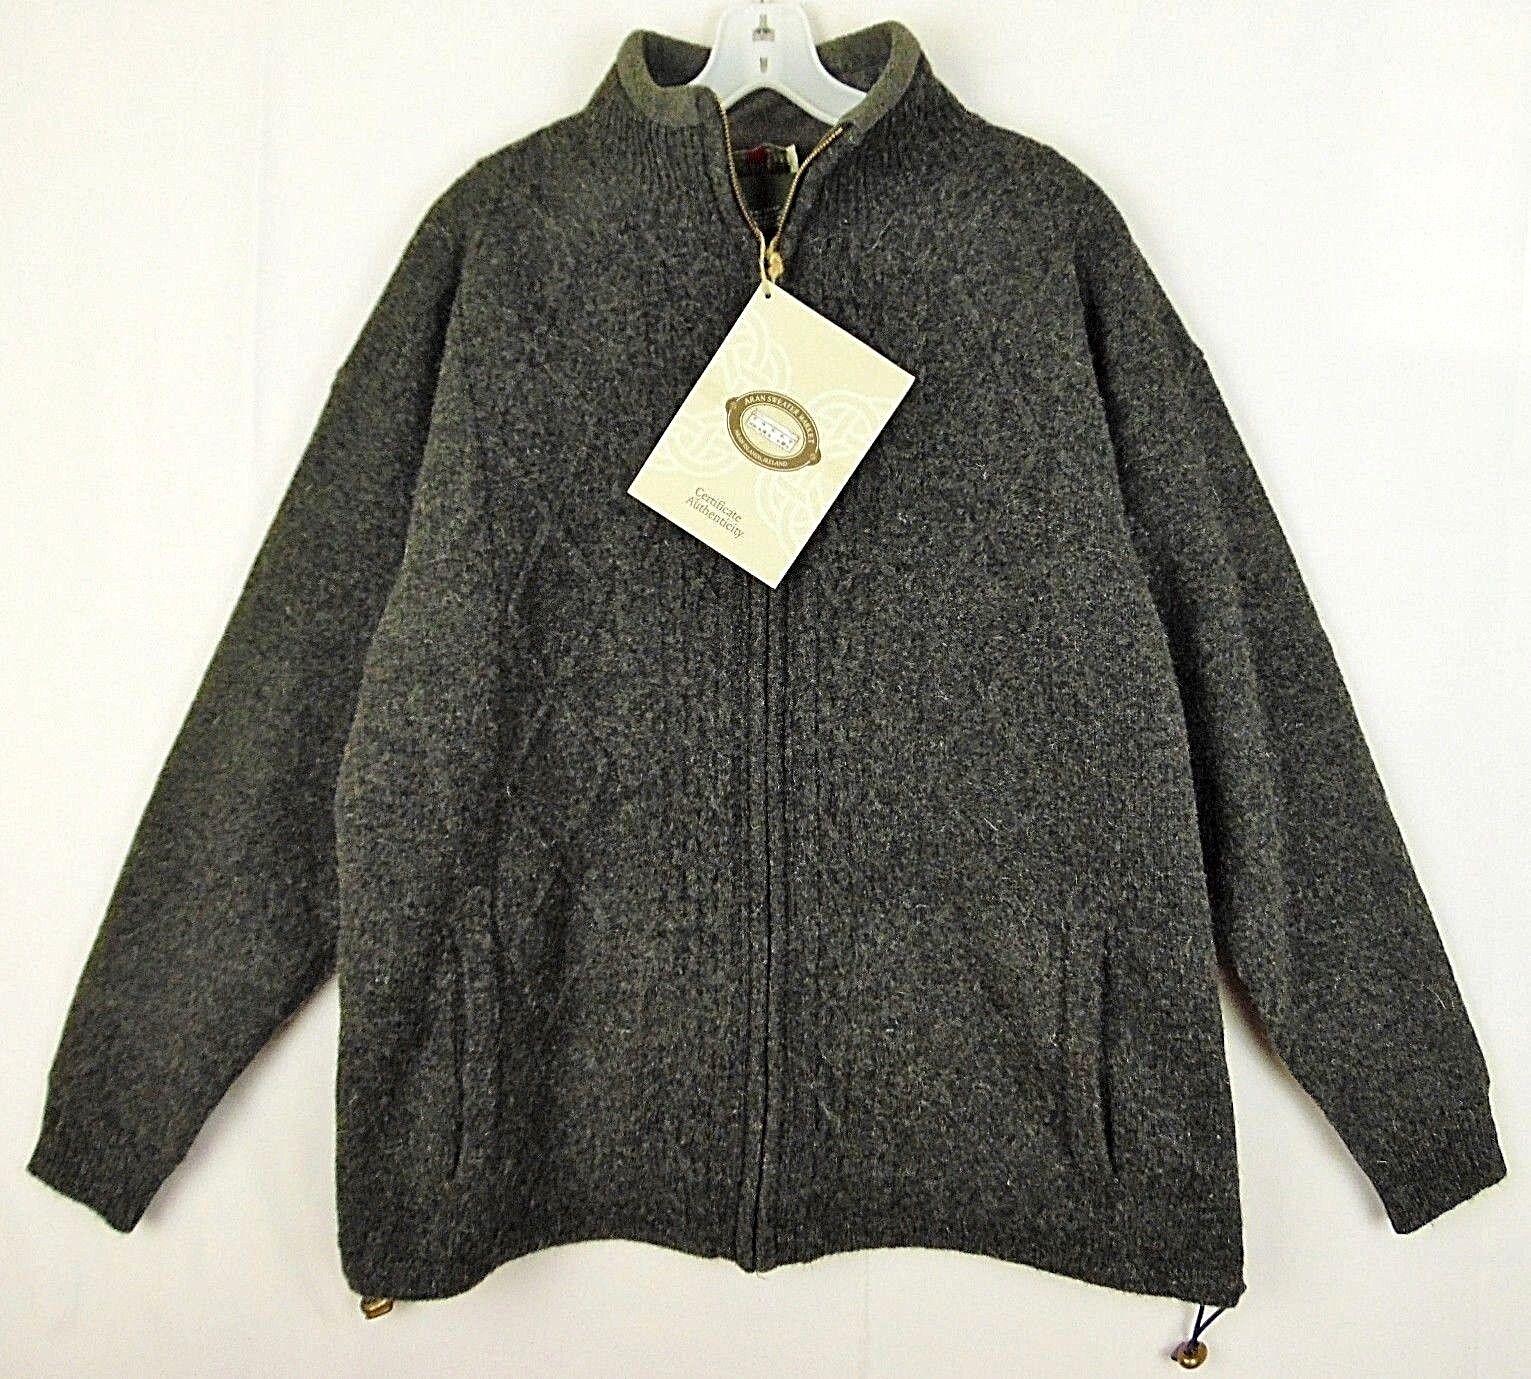 Carraig Donn Ireland  Herren M grau Wool Lined Fisherman Sweater Coat NEW